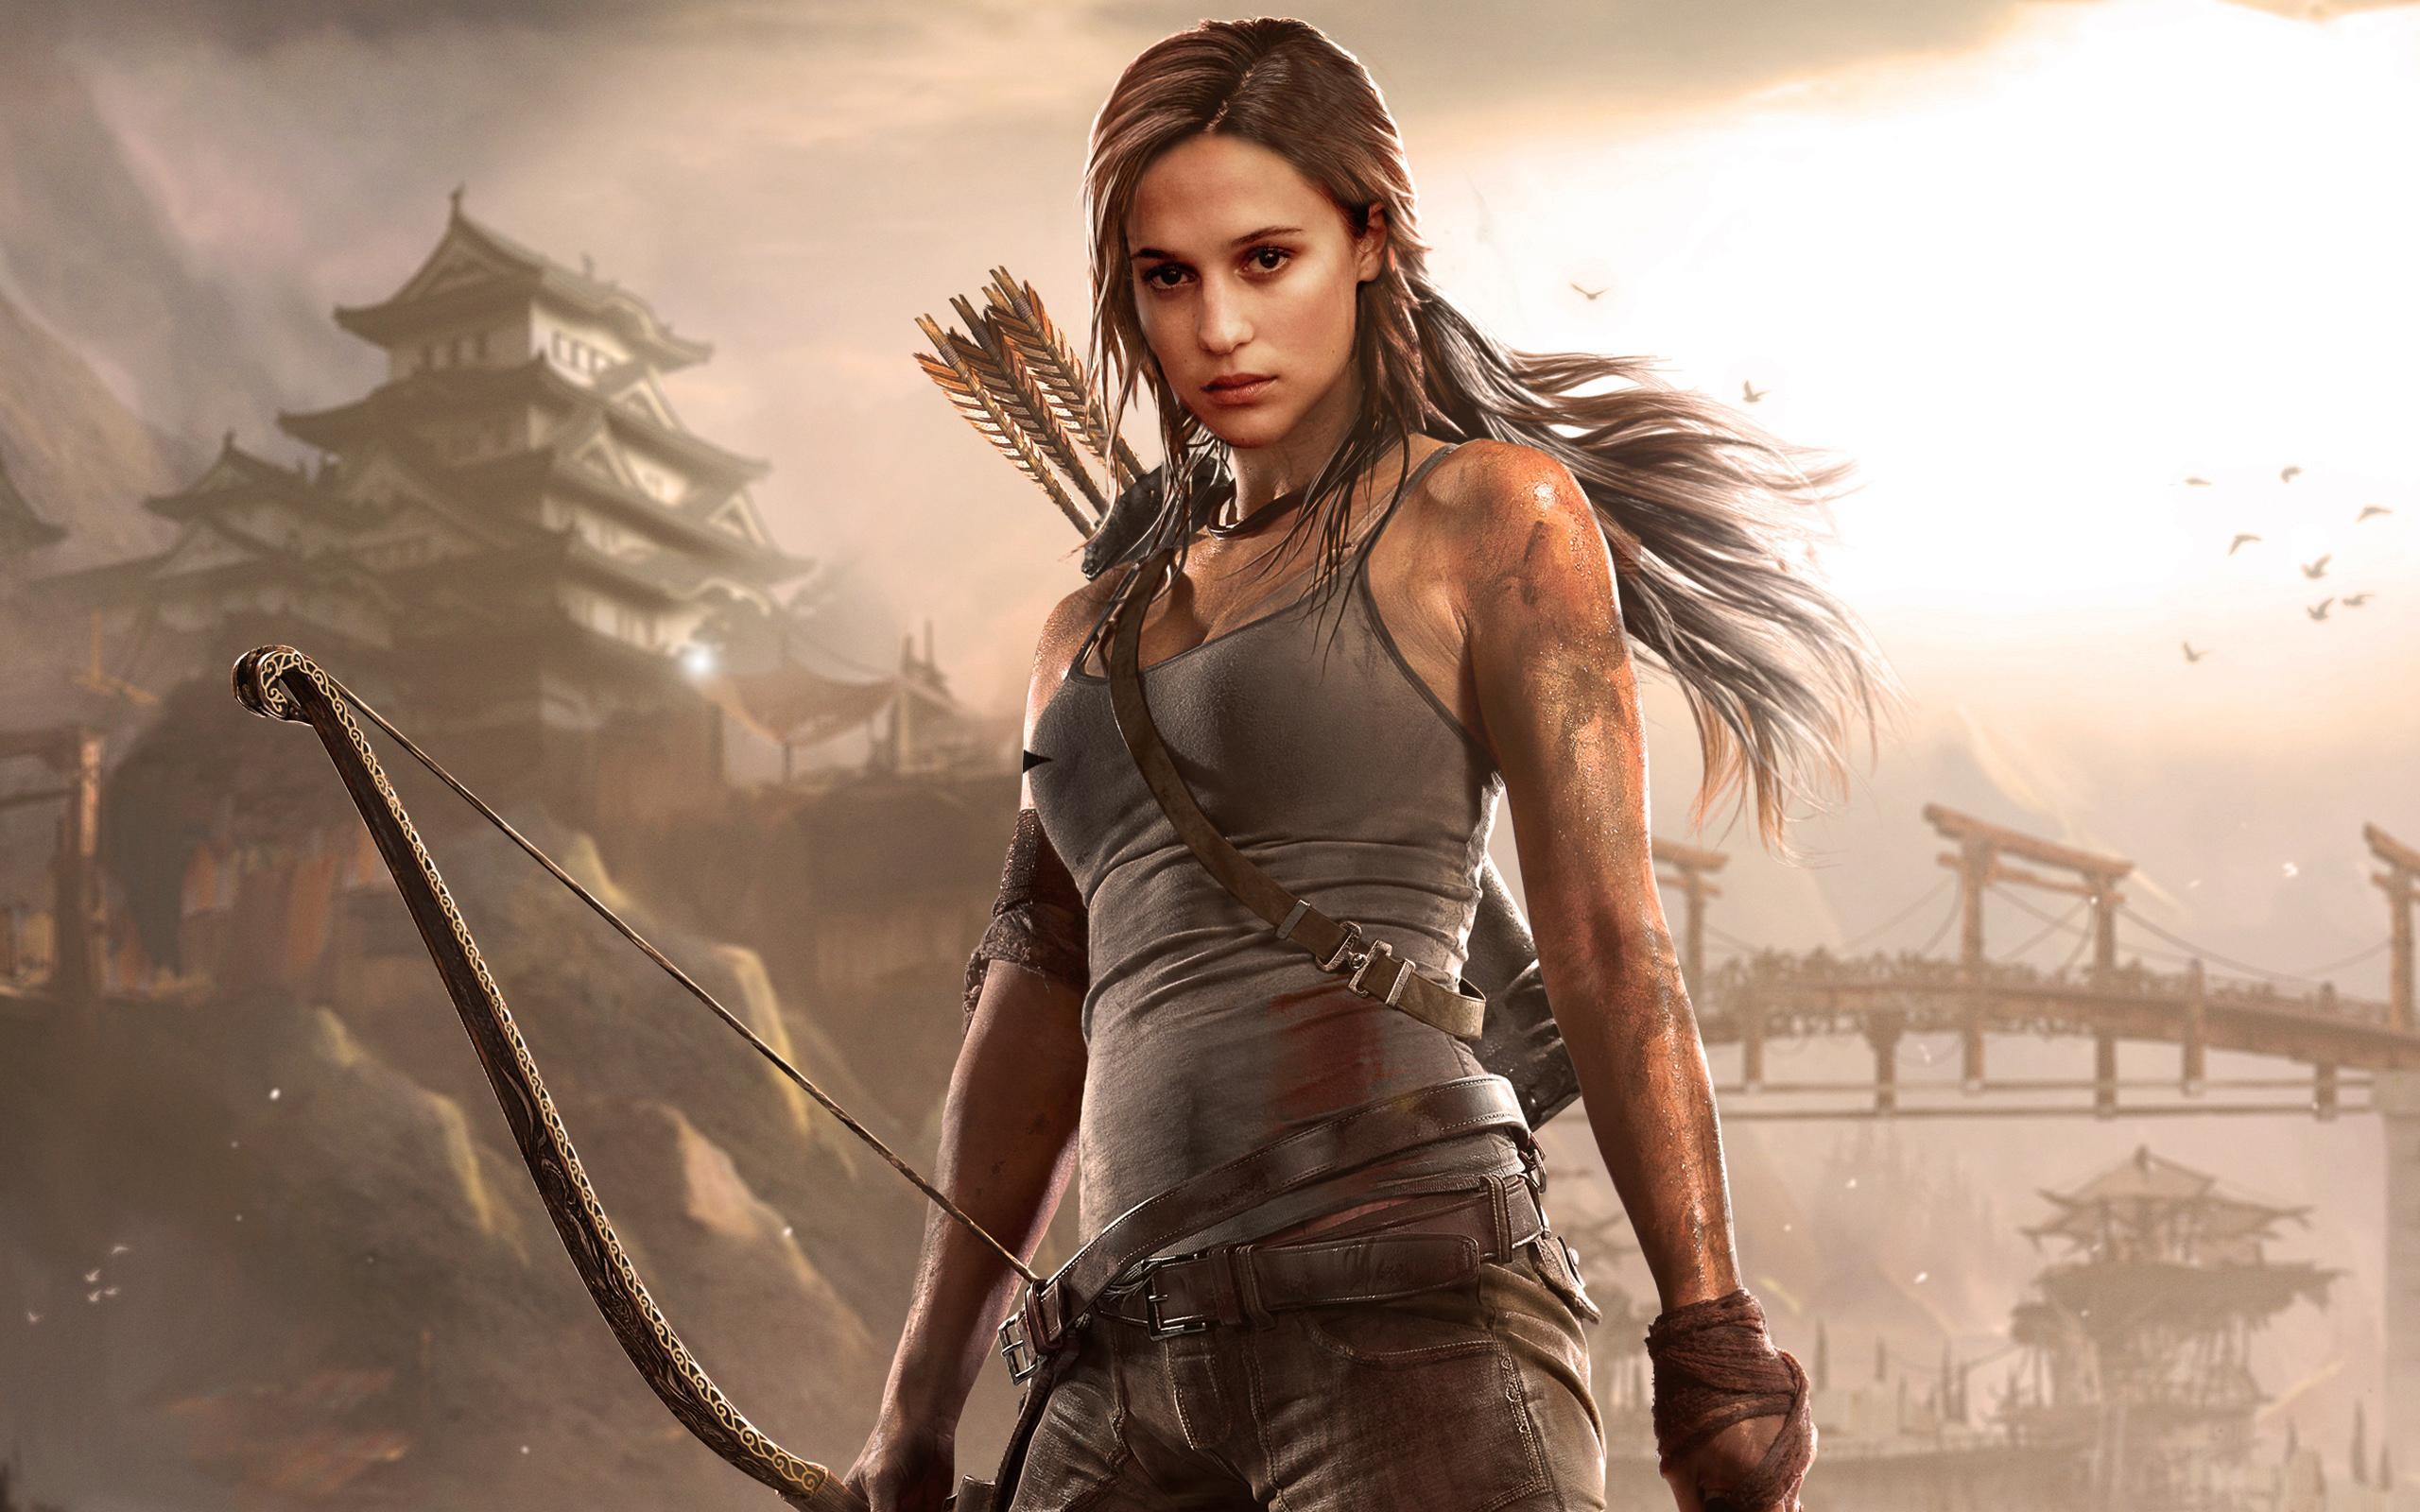 Hateful 8 Actor Cast As New Tomb Raider Villain Flickreel